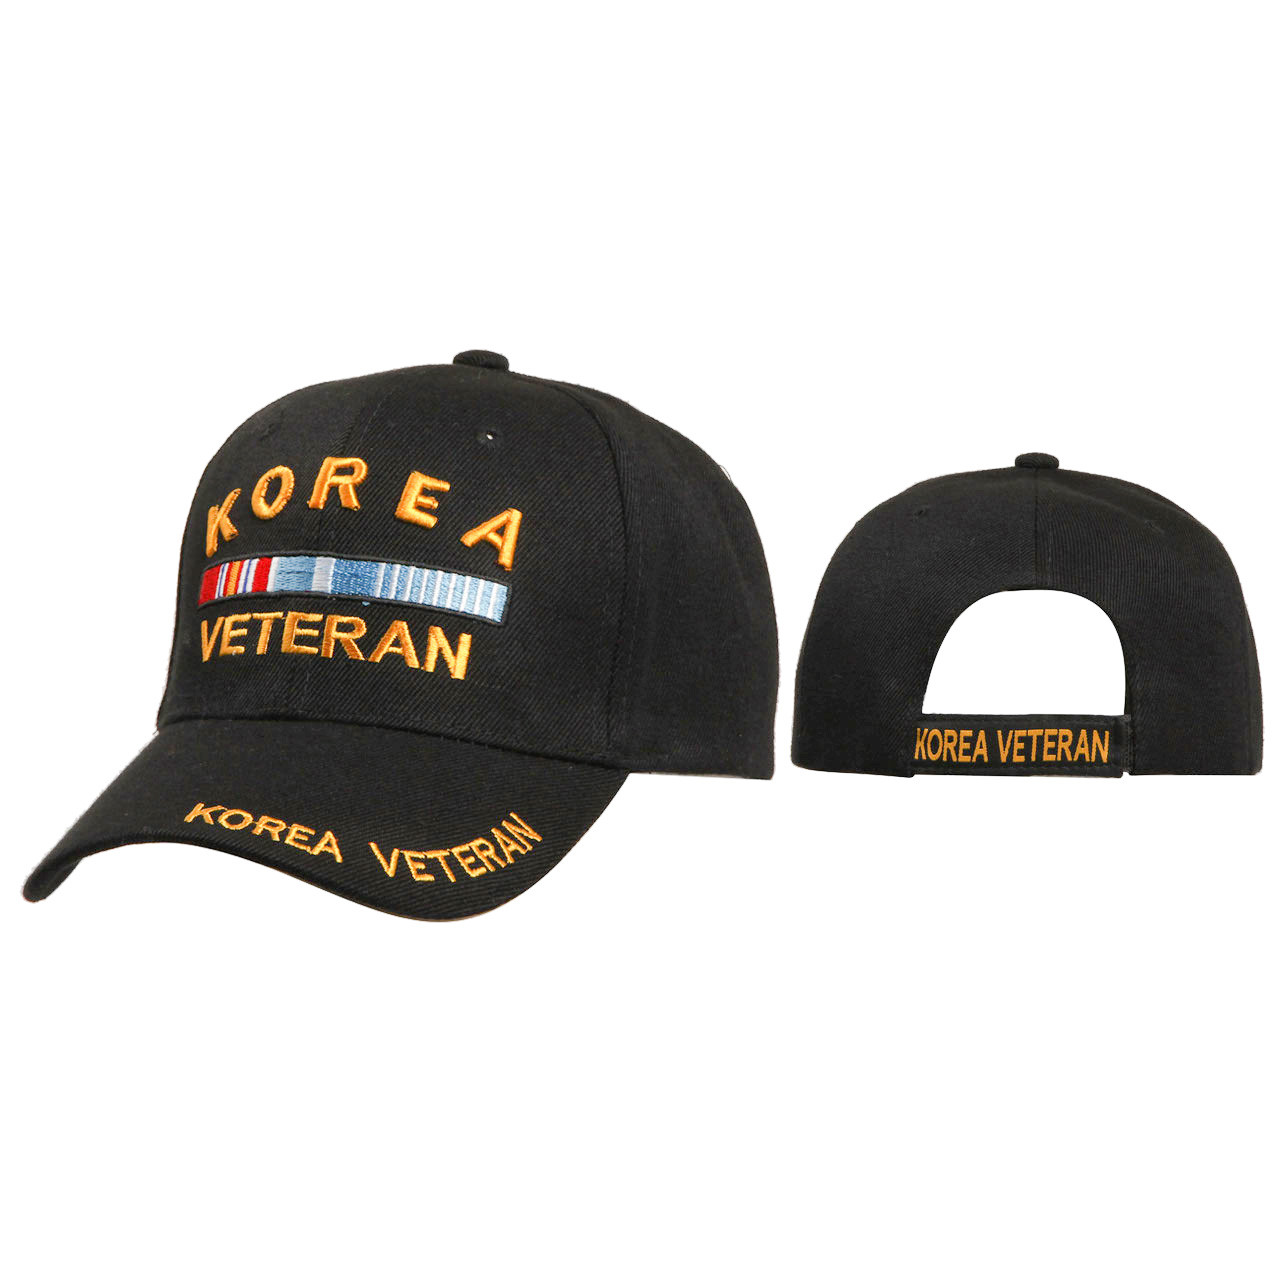 Veterans Baseball Caps Wholesale C155 ~ Korea Veteran